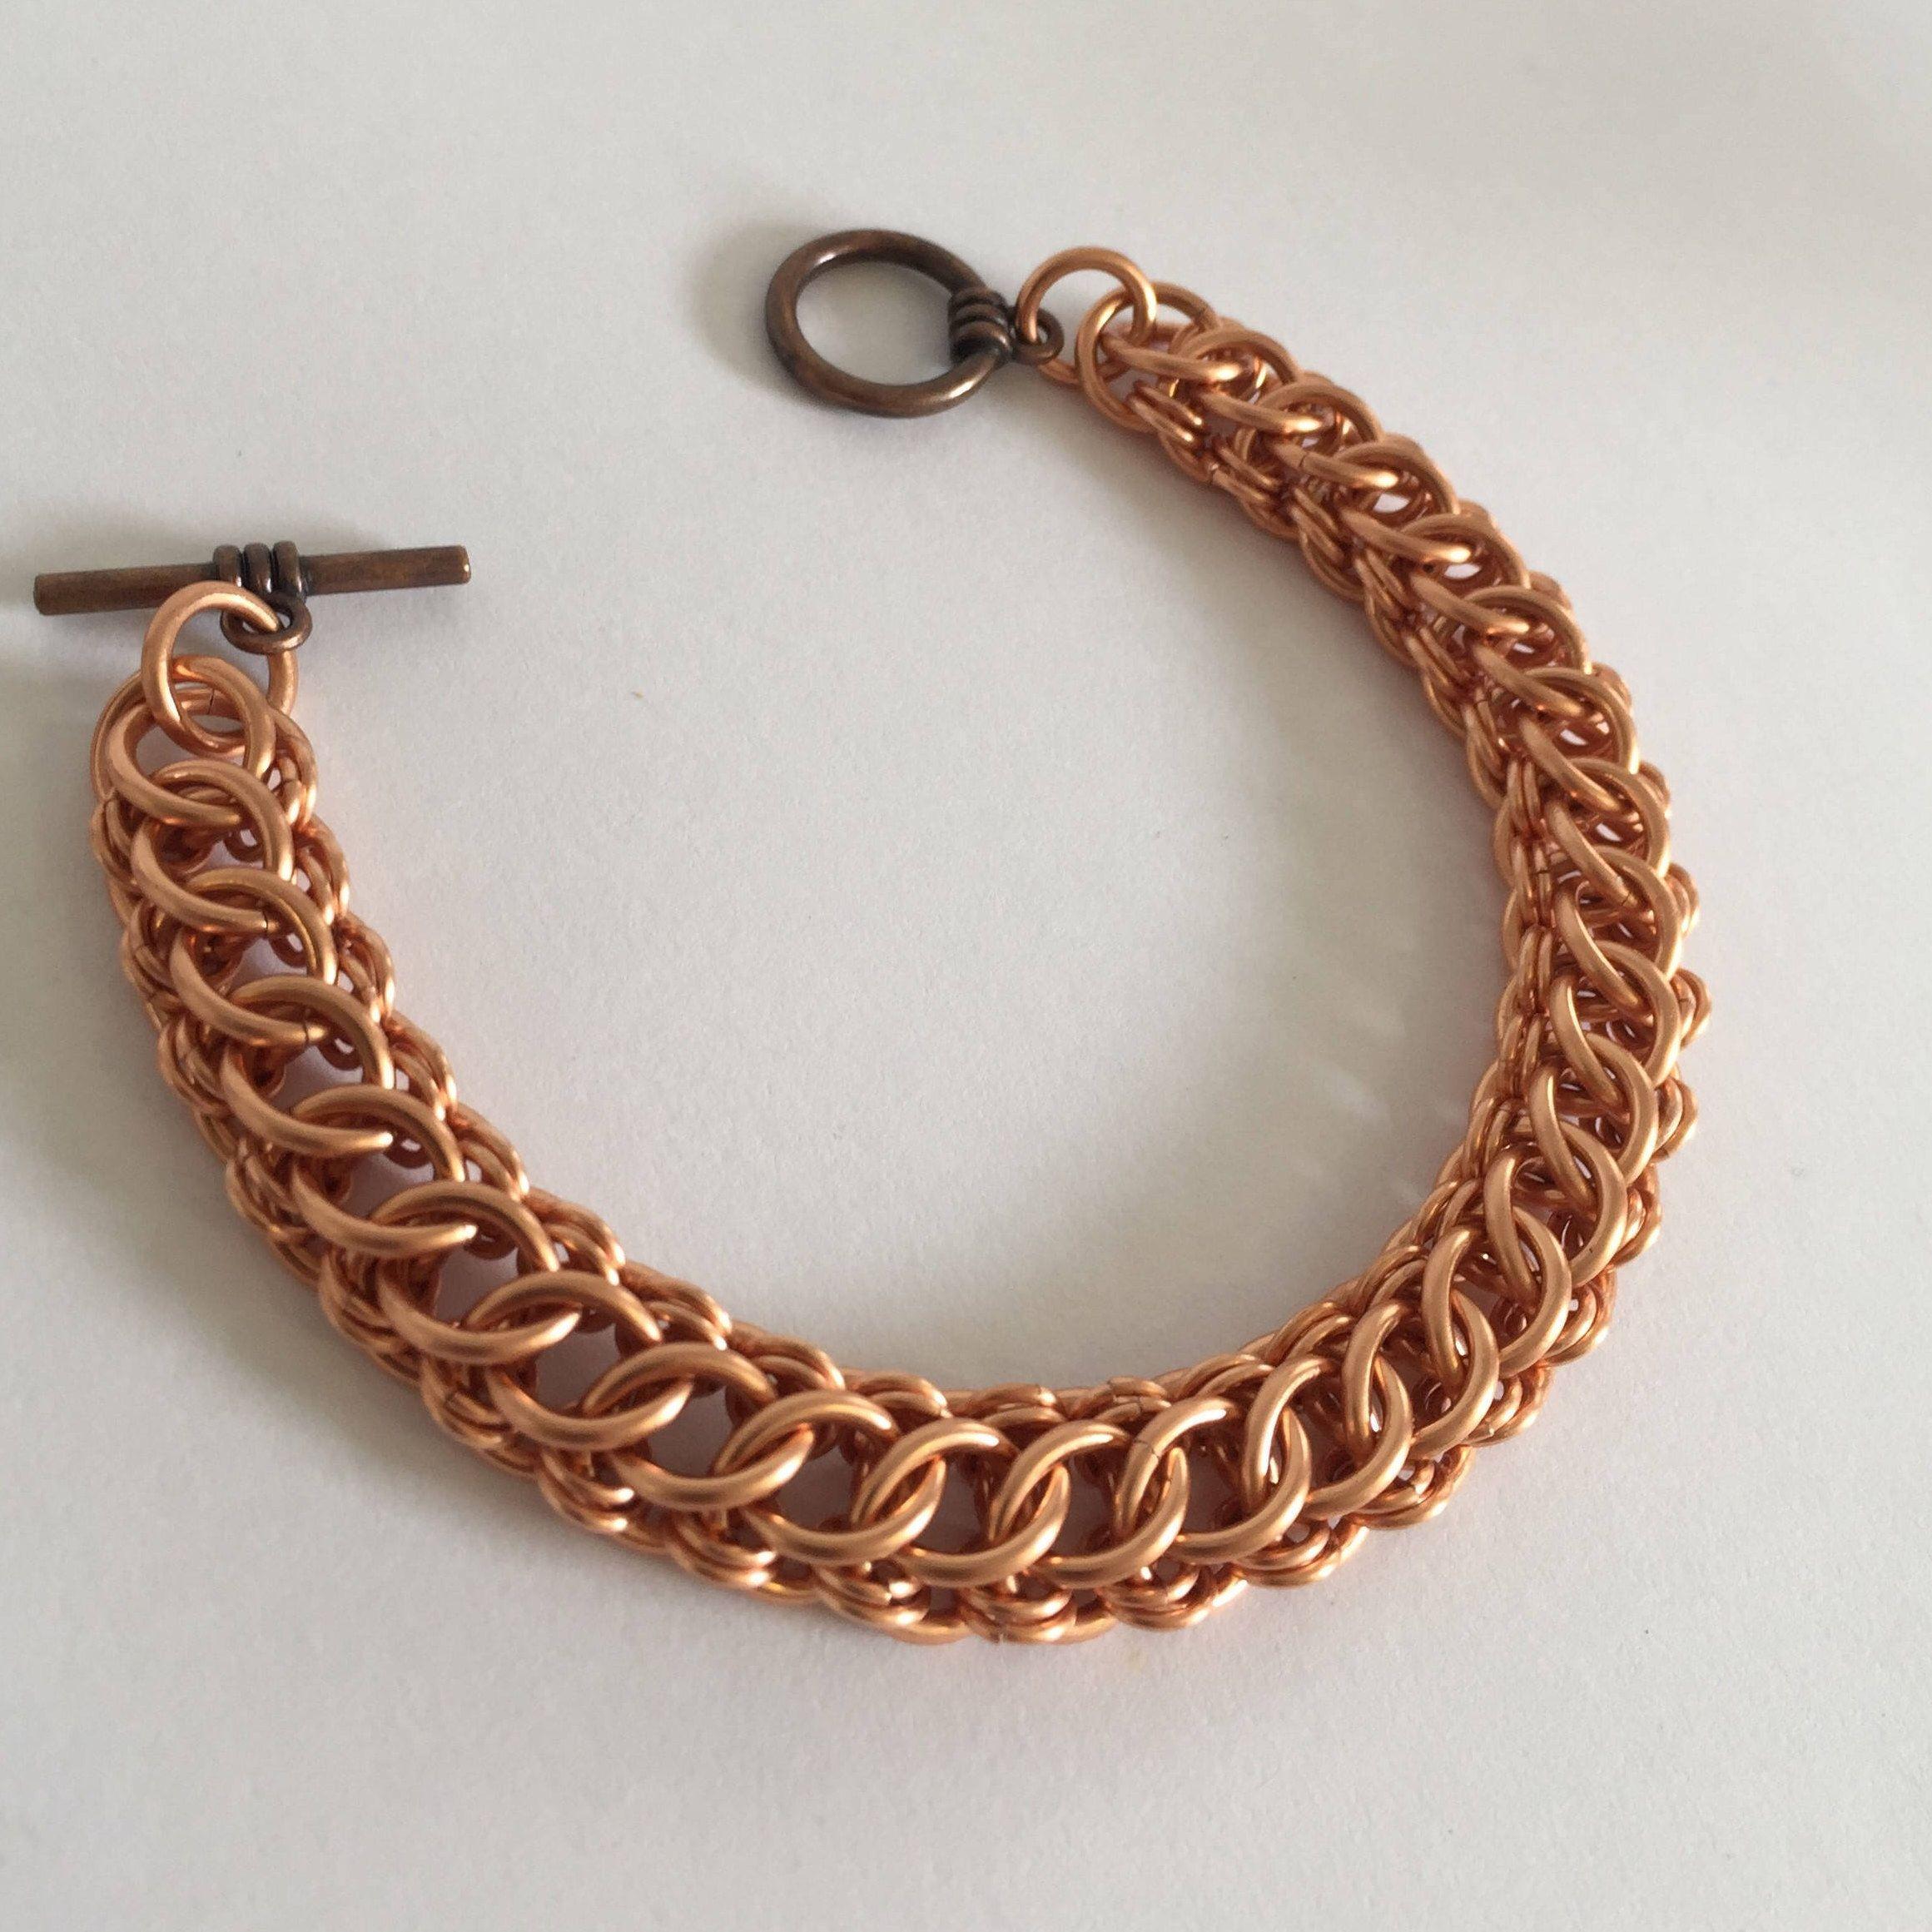 Copper Bracelet Men, Copper Chainmaille, Male Bracelet, Copper Chain Link  Bracelet, Mens Metal Jewelry, Male Birthday Gift In Copper